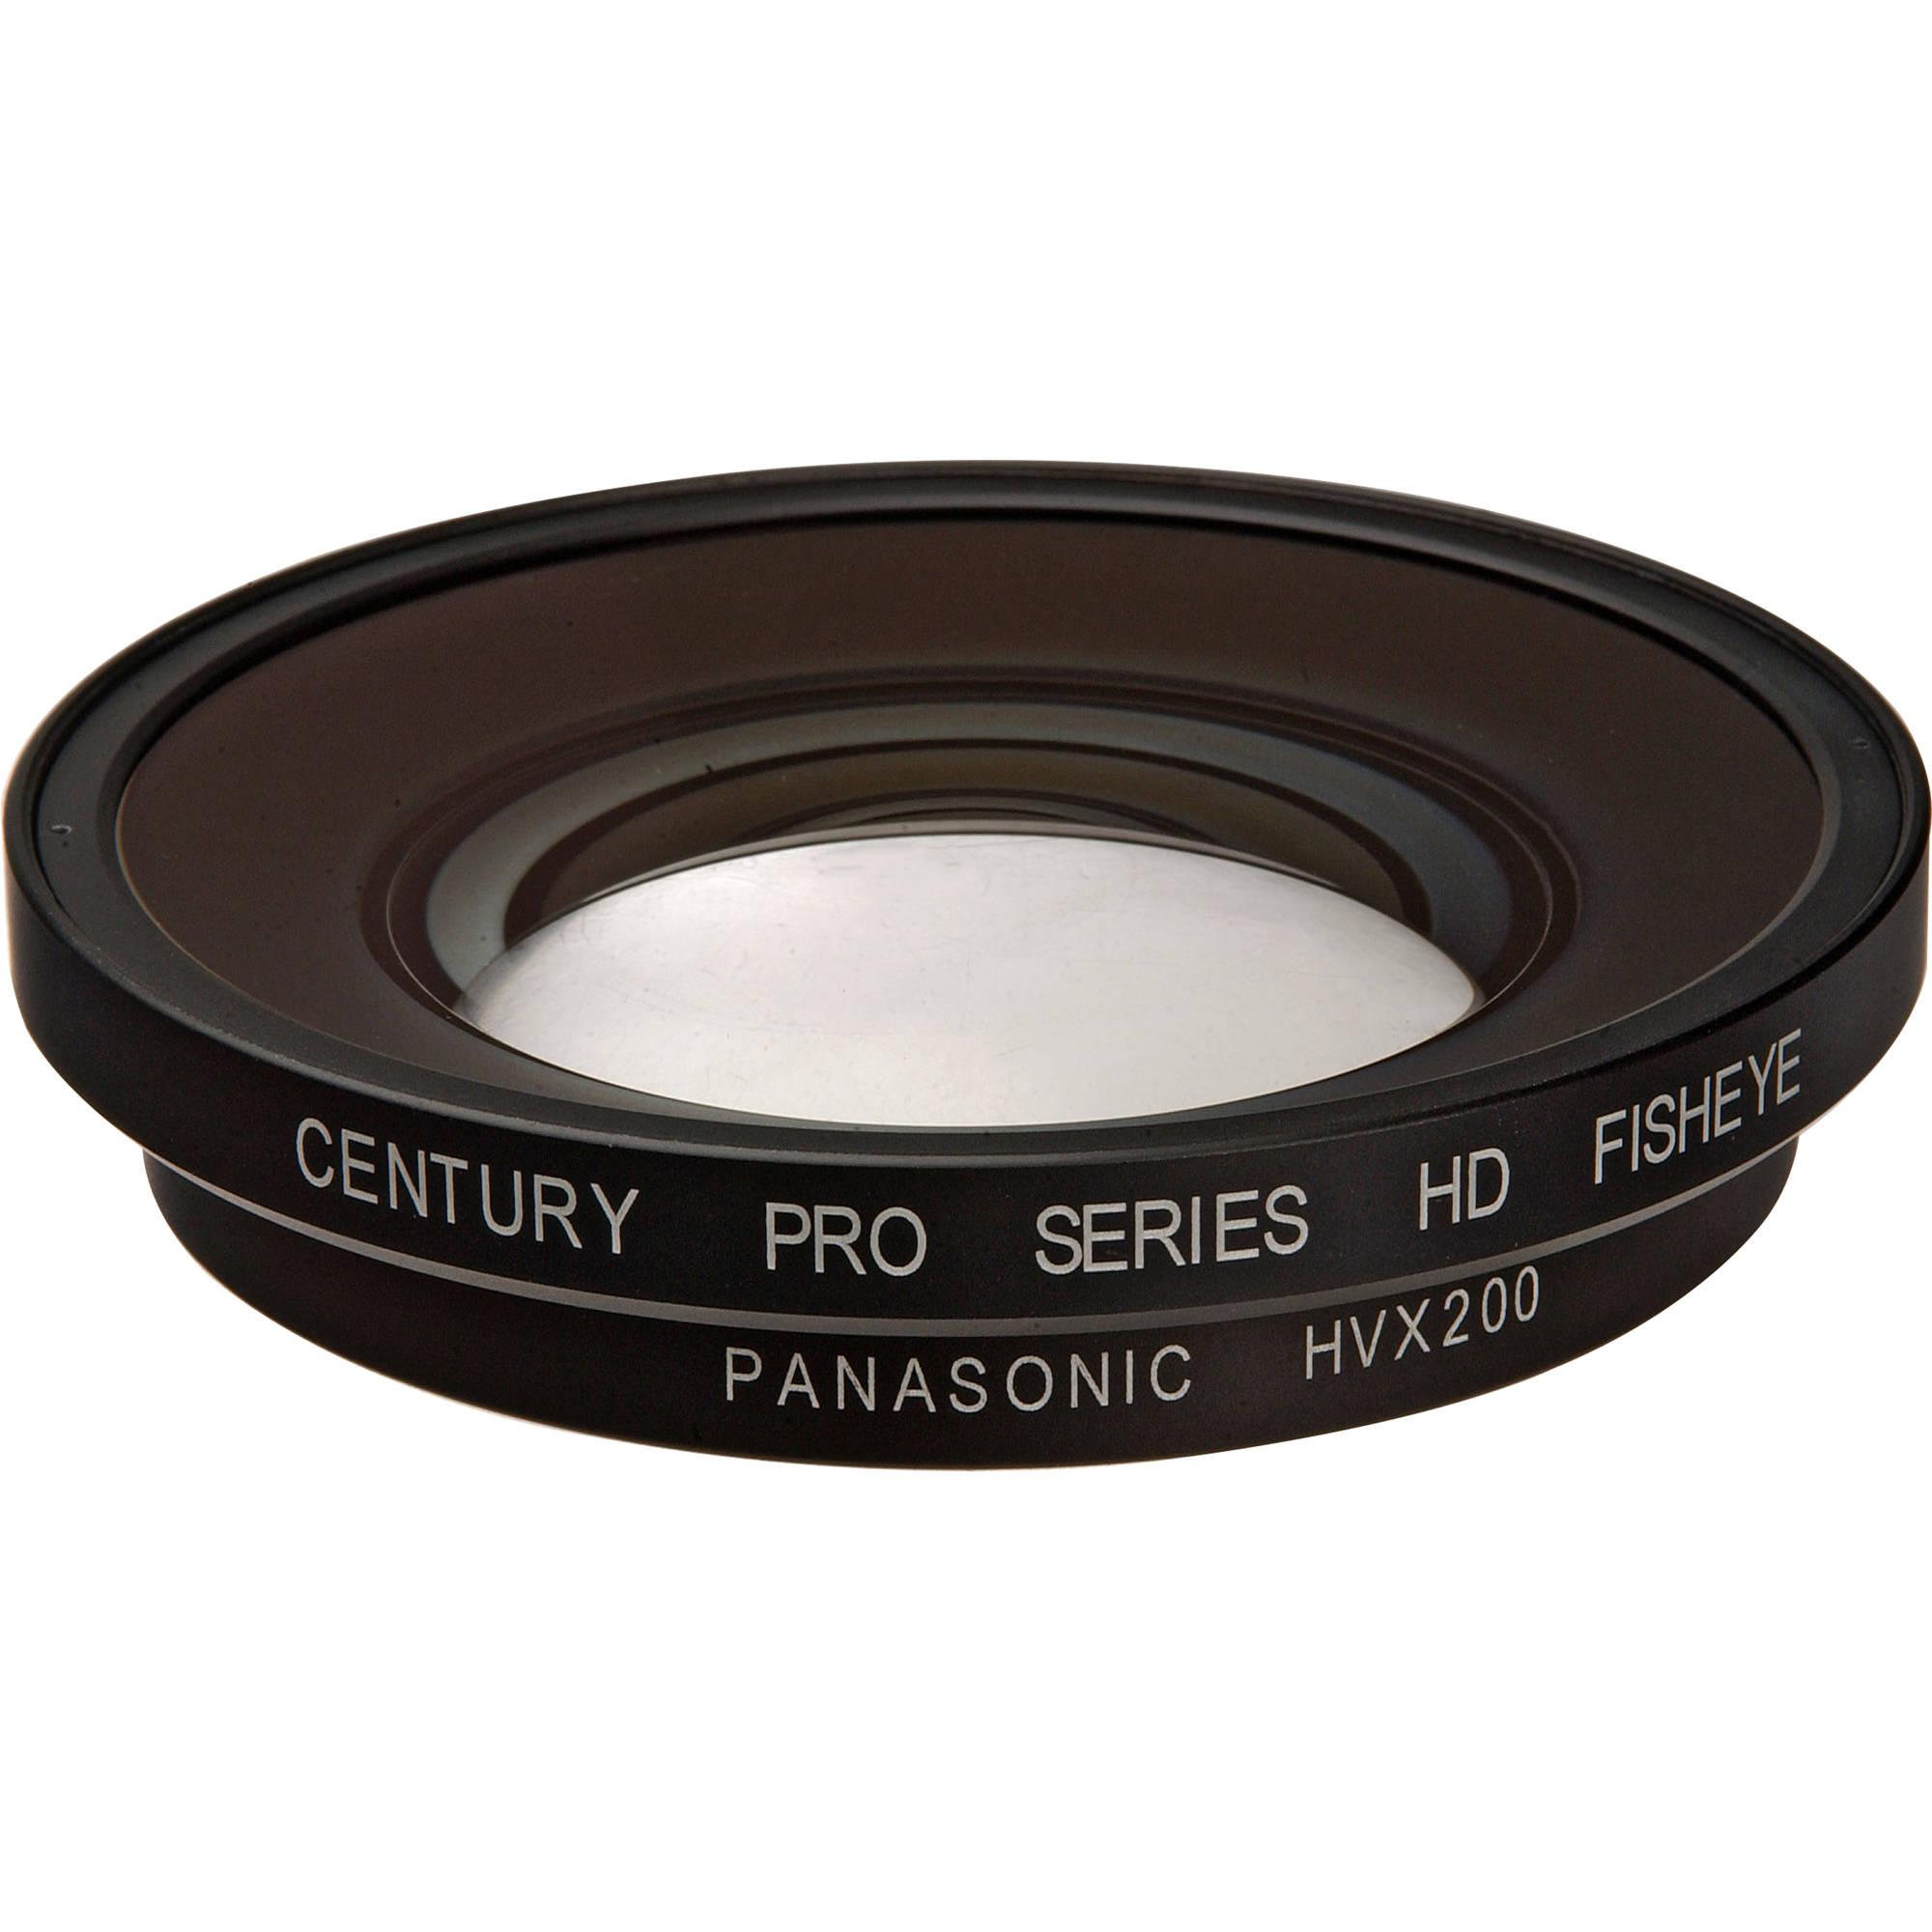 0.21x-0.22x High Grade Fish-Eye Lens Nw Direct Micro Fiber Cleaning Cloth for Panasonic HC-WXF991K